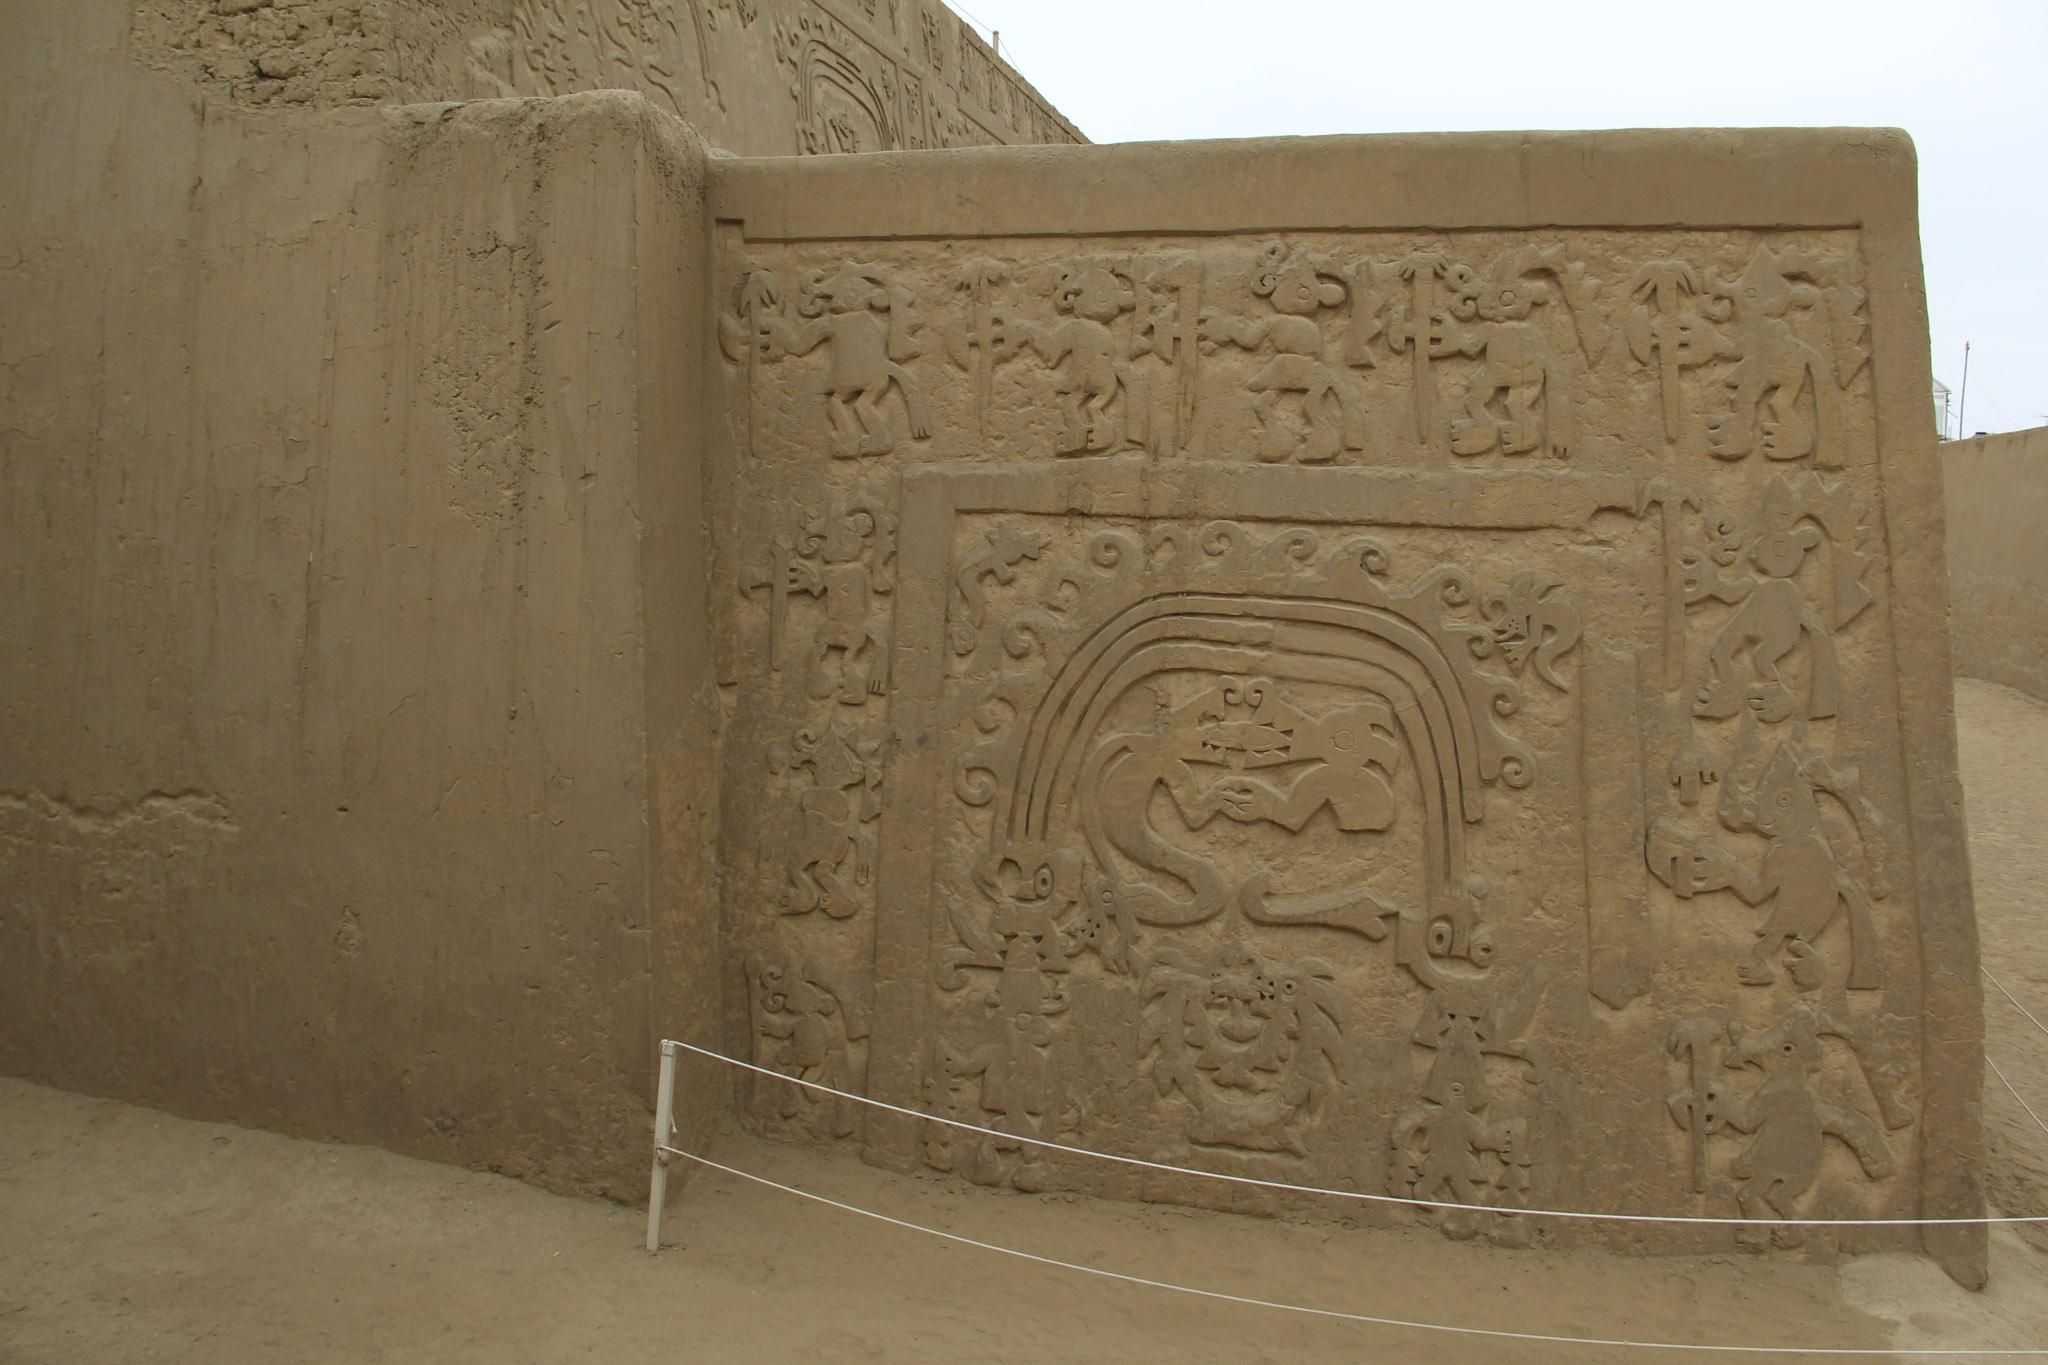 Huaca Arco Irir